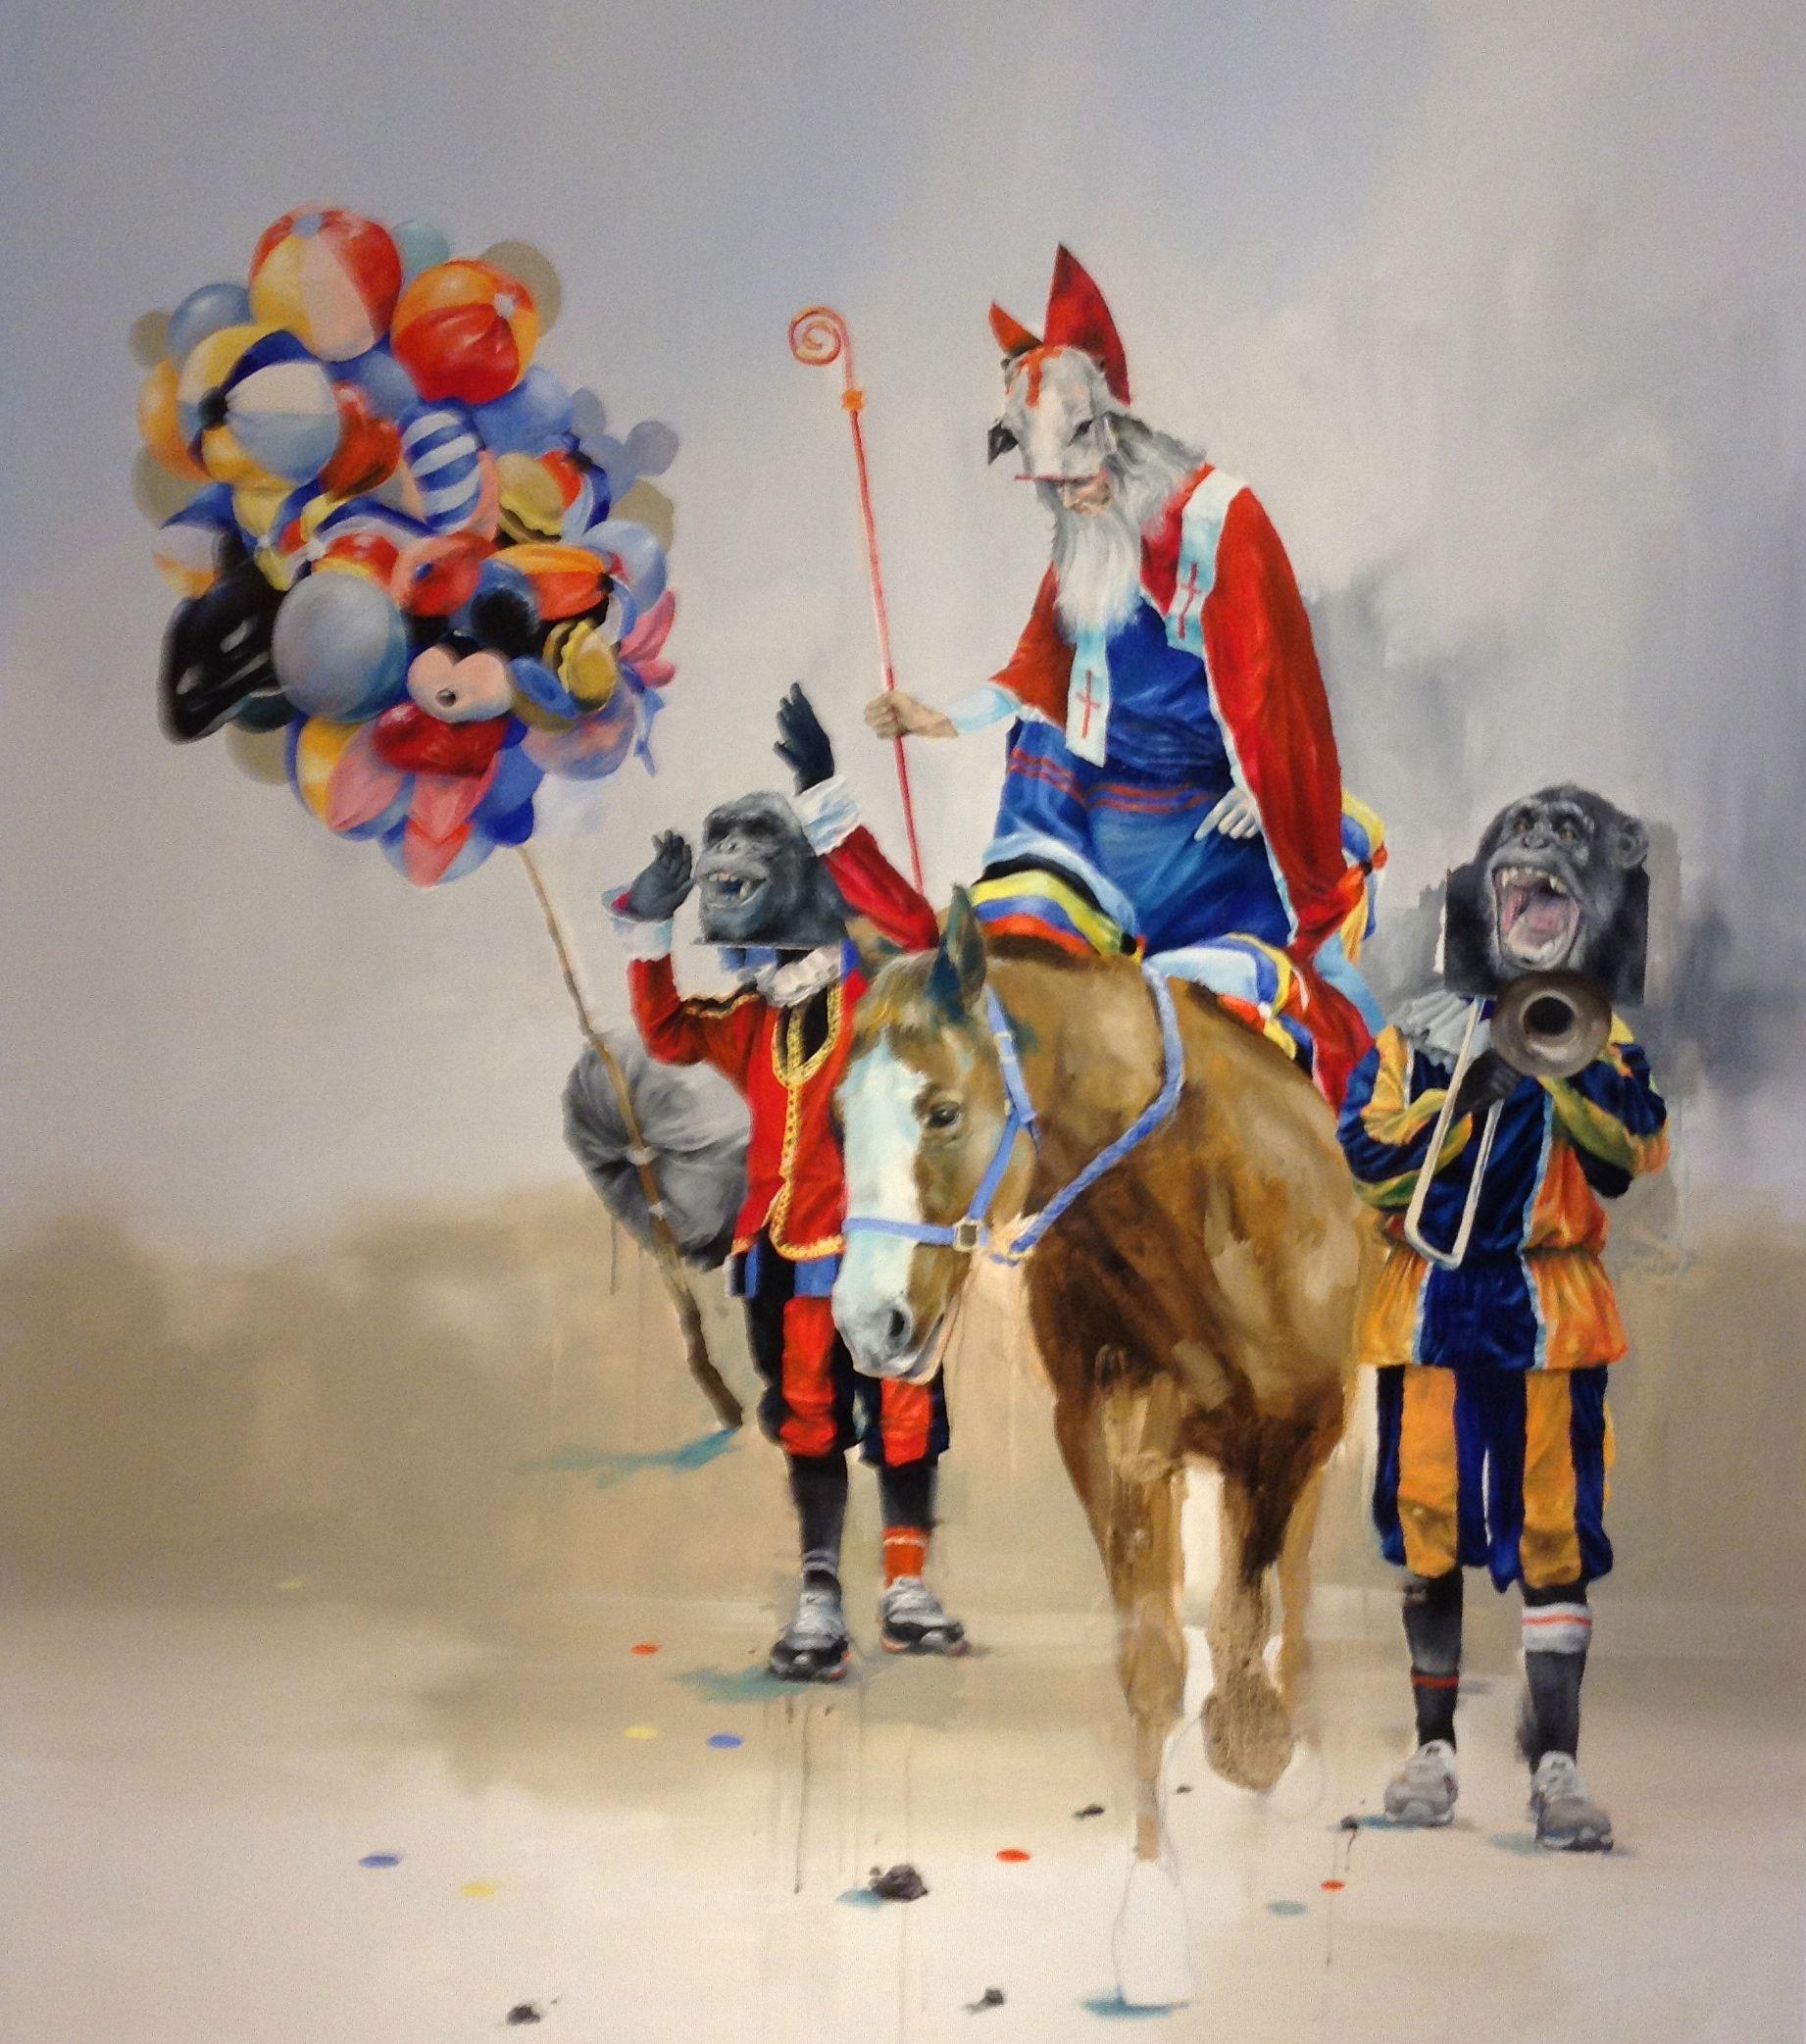 Joram roukes desolated parade oil on canvas 2012